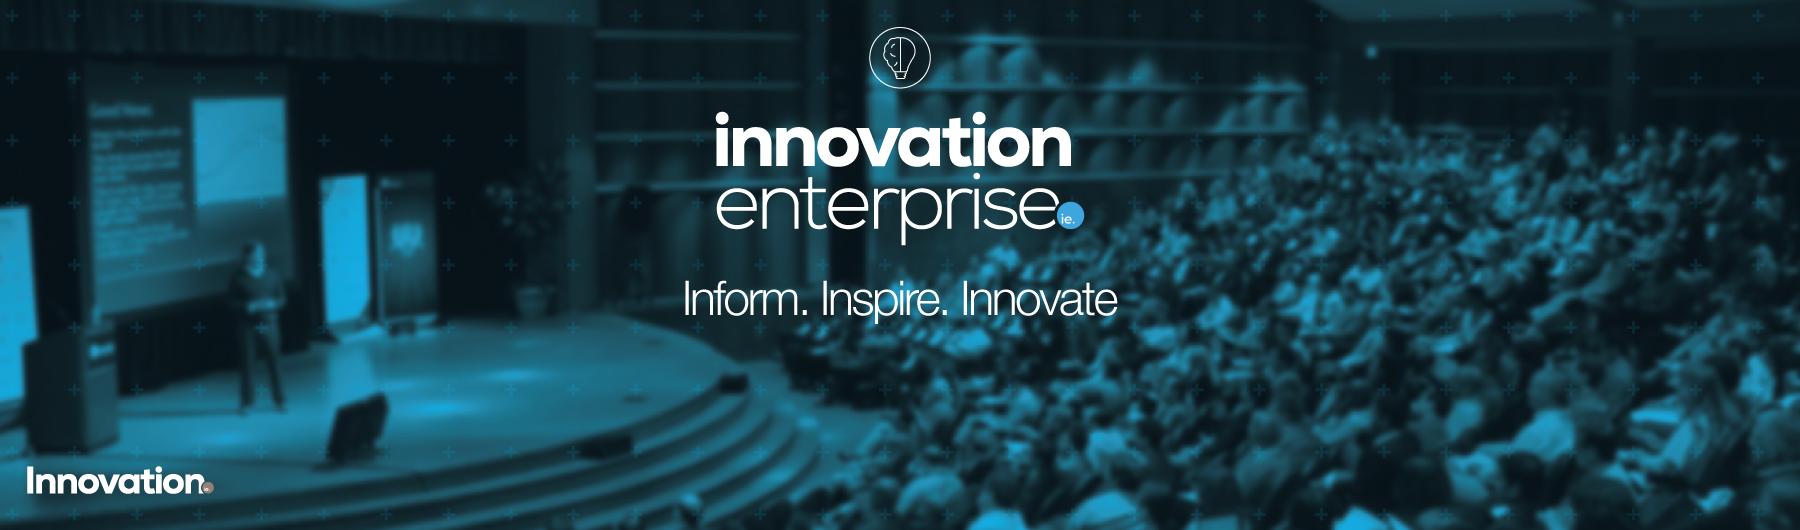 CxO Innovation Festival